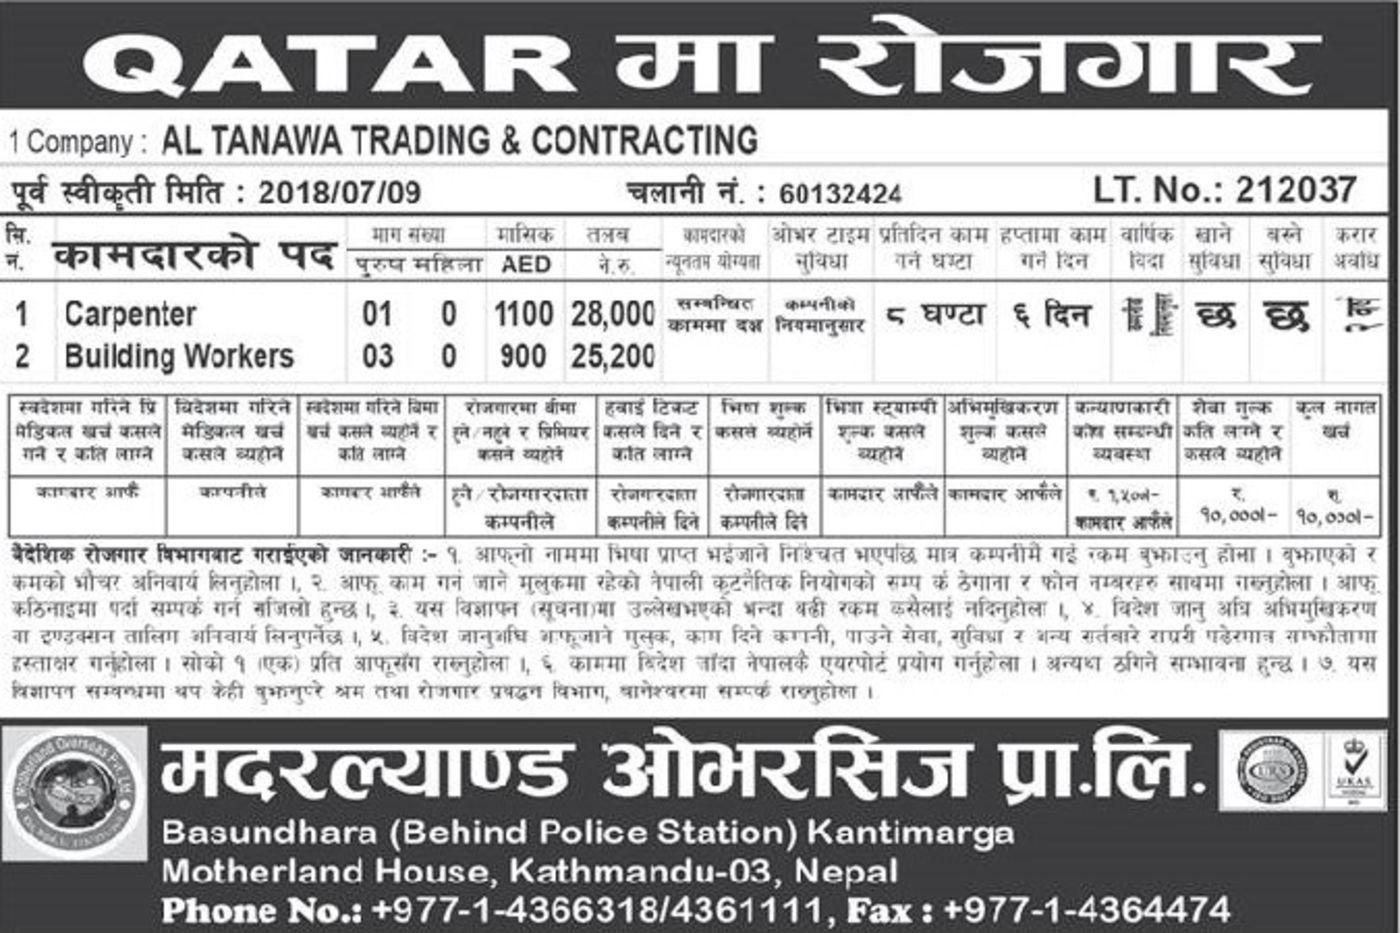 Jobs Nepal - Vacancy - Carpenter, Building Workers - AL Tanawa